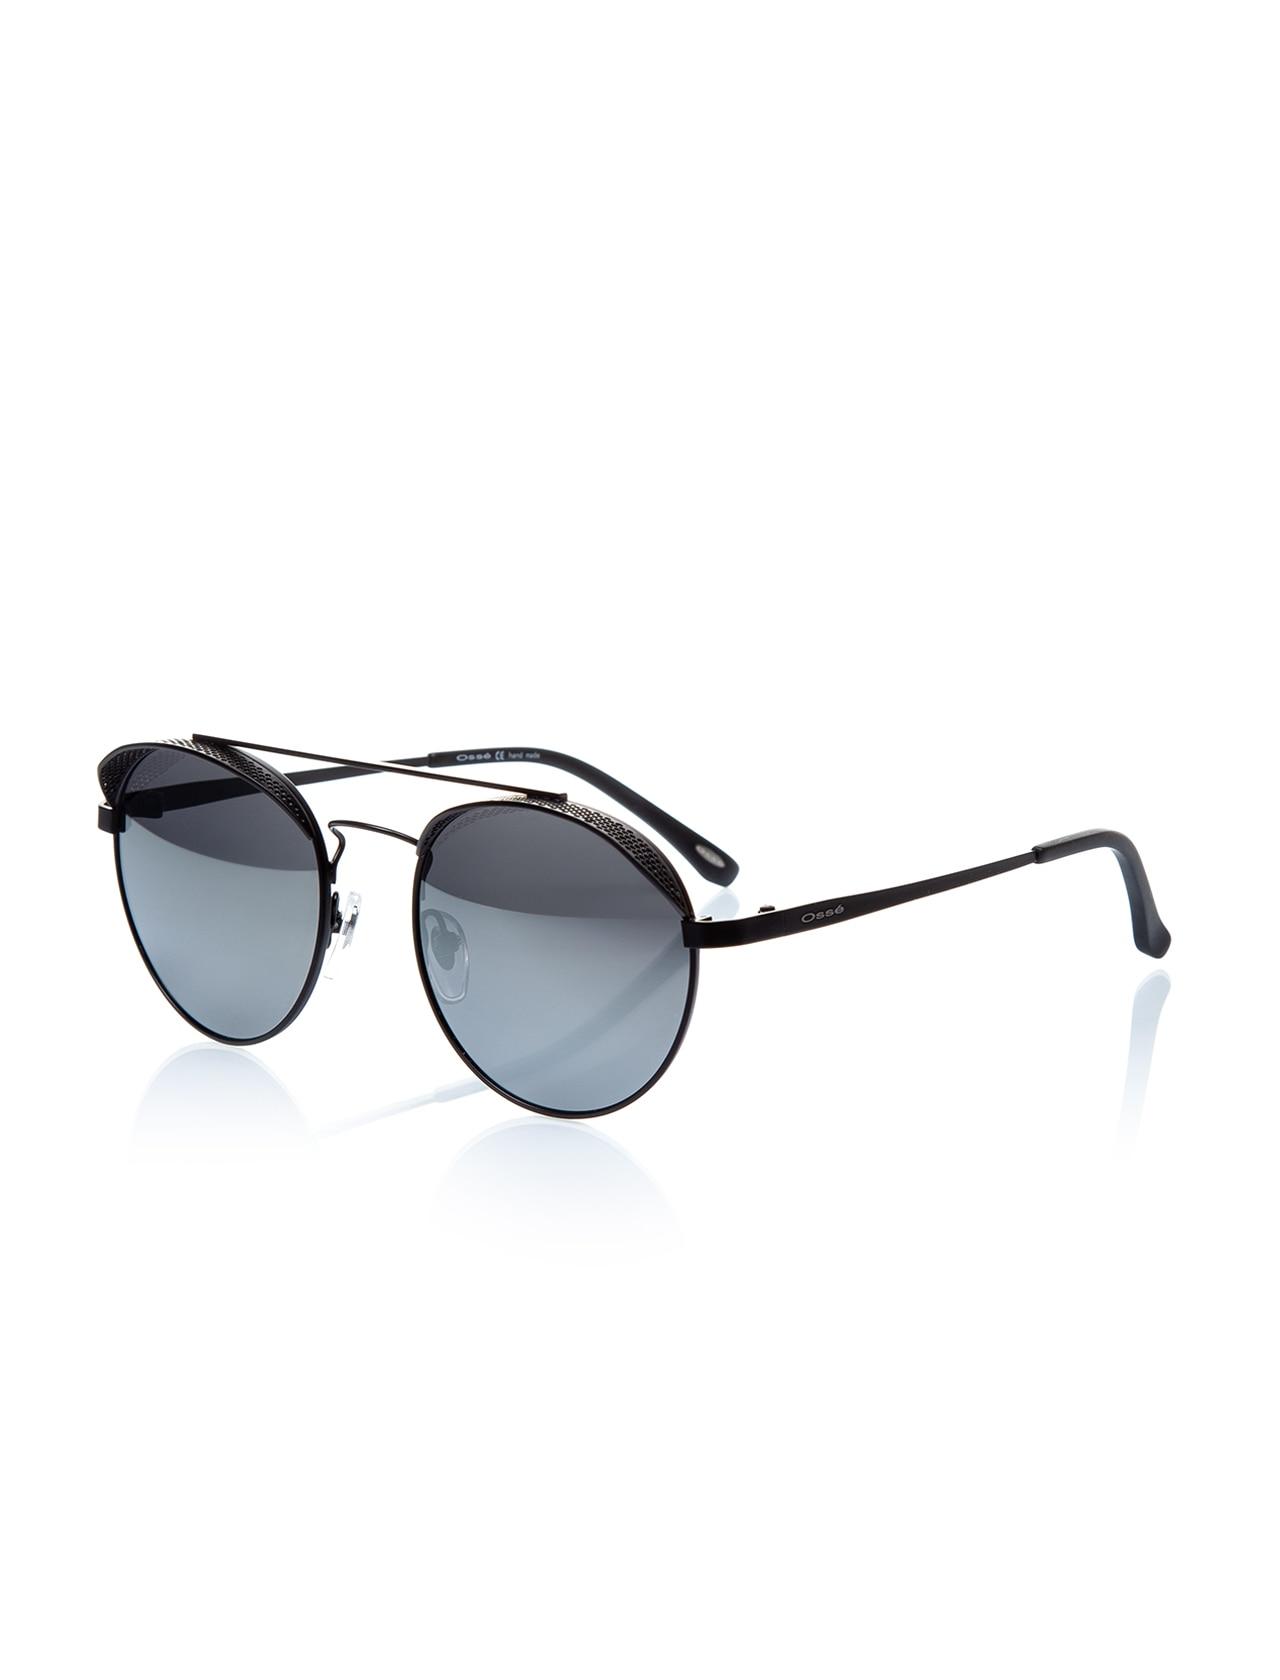 Unisex sunglasses os 2549 03 metal black organic round round 53-19-138 osse